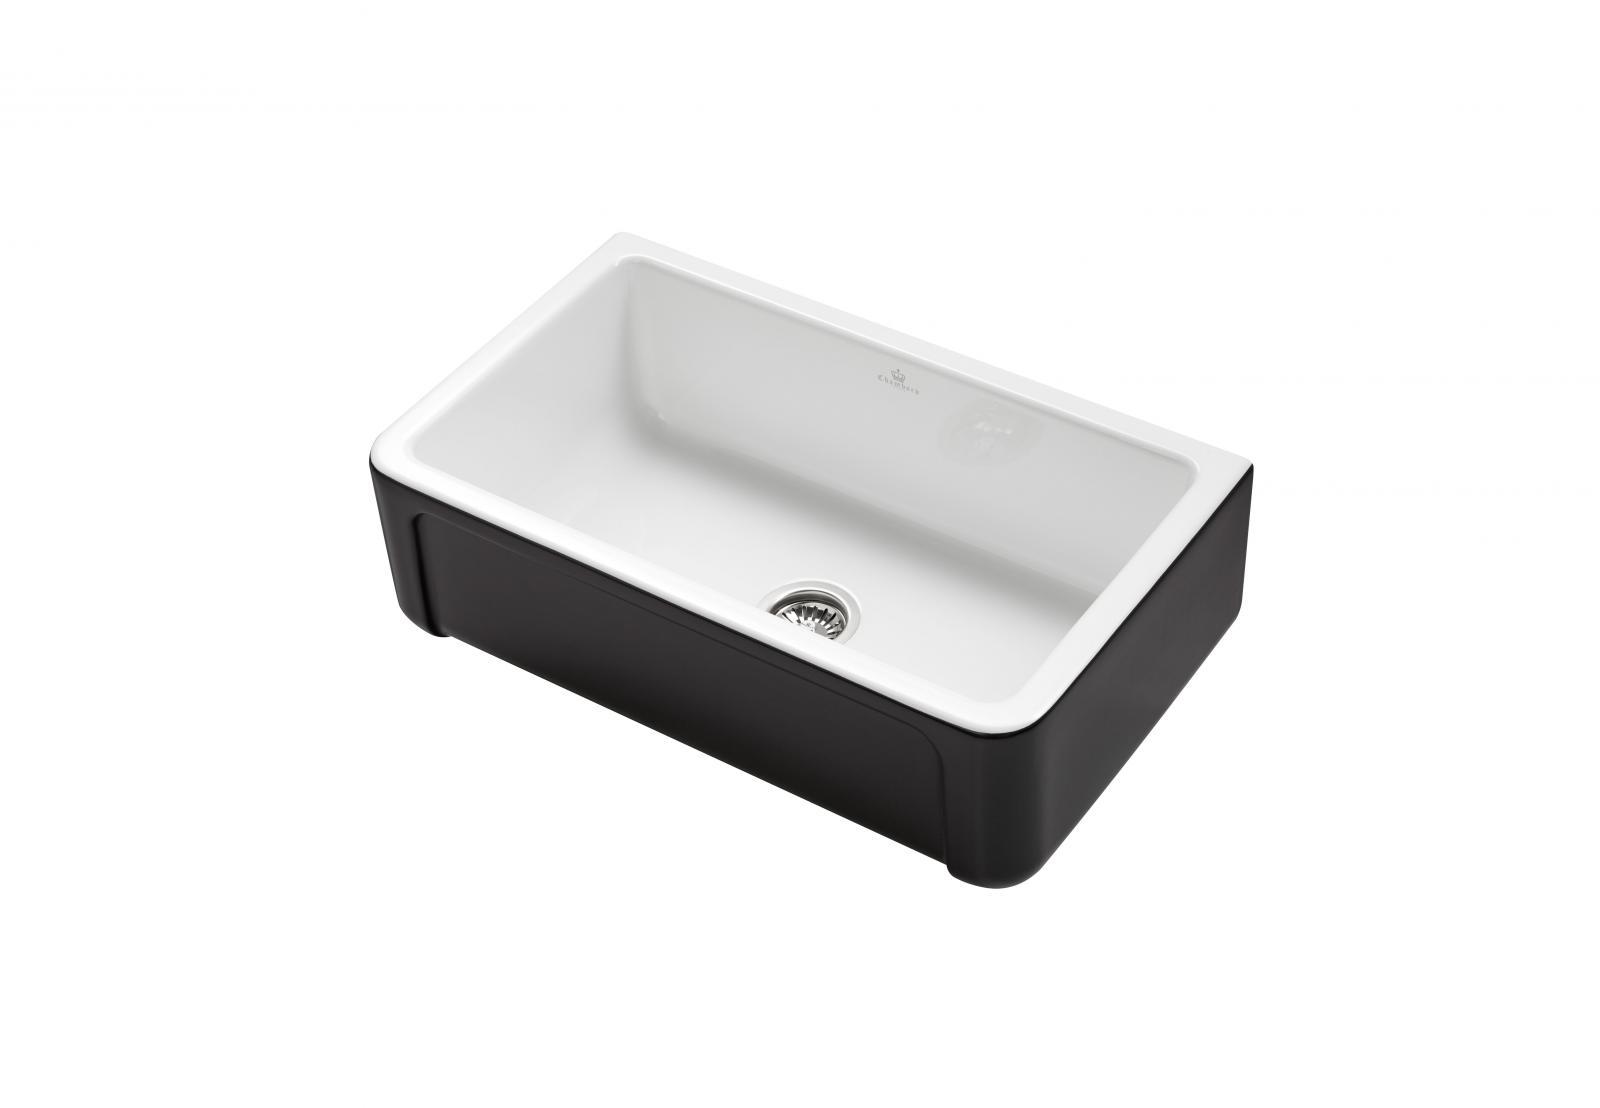 High-quality sink Henri II Le Grand Black - single bowl, ceramic ambience